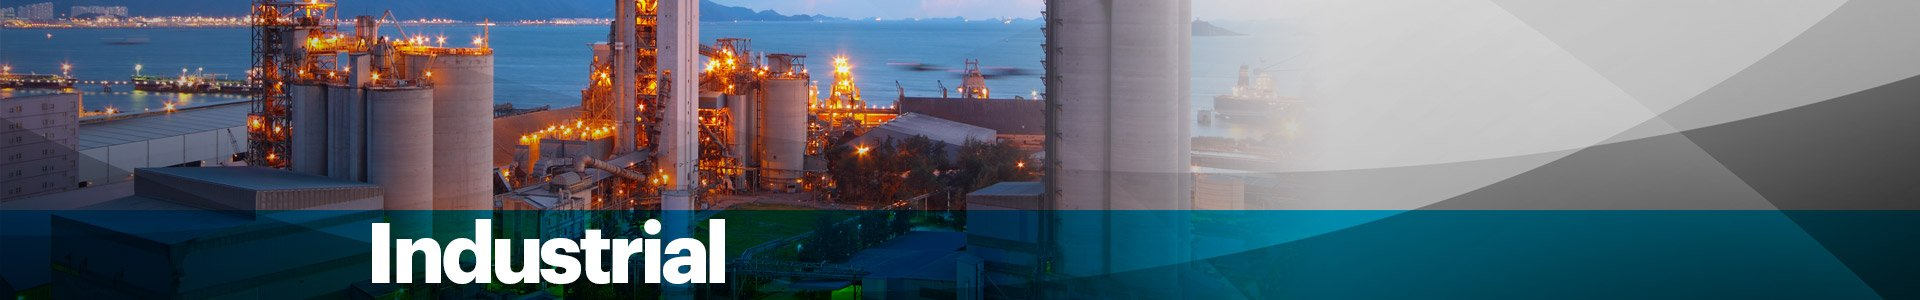 Industrial Industry Banner